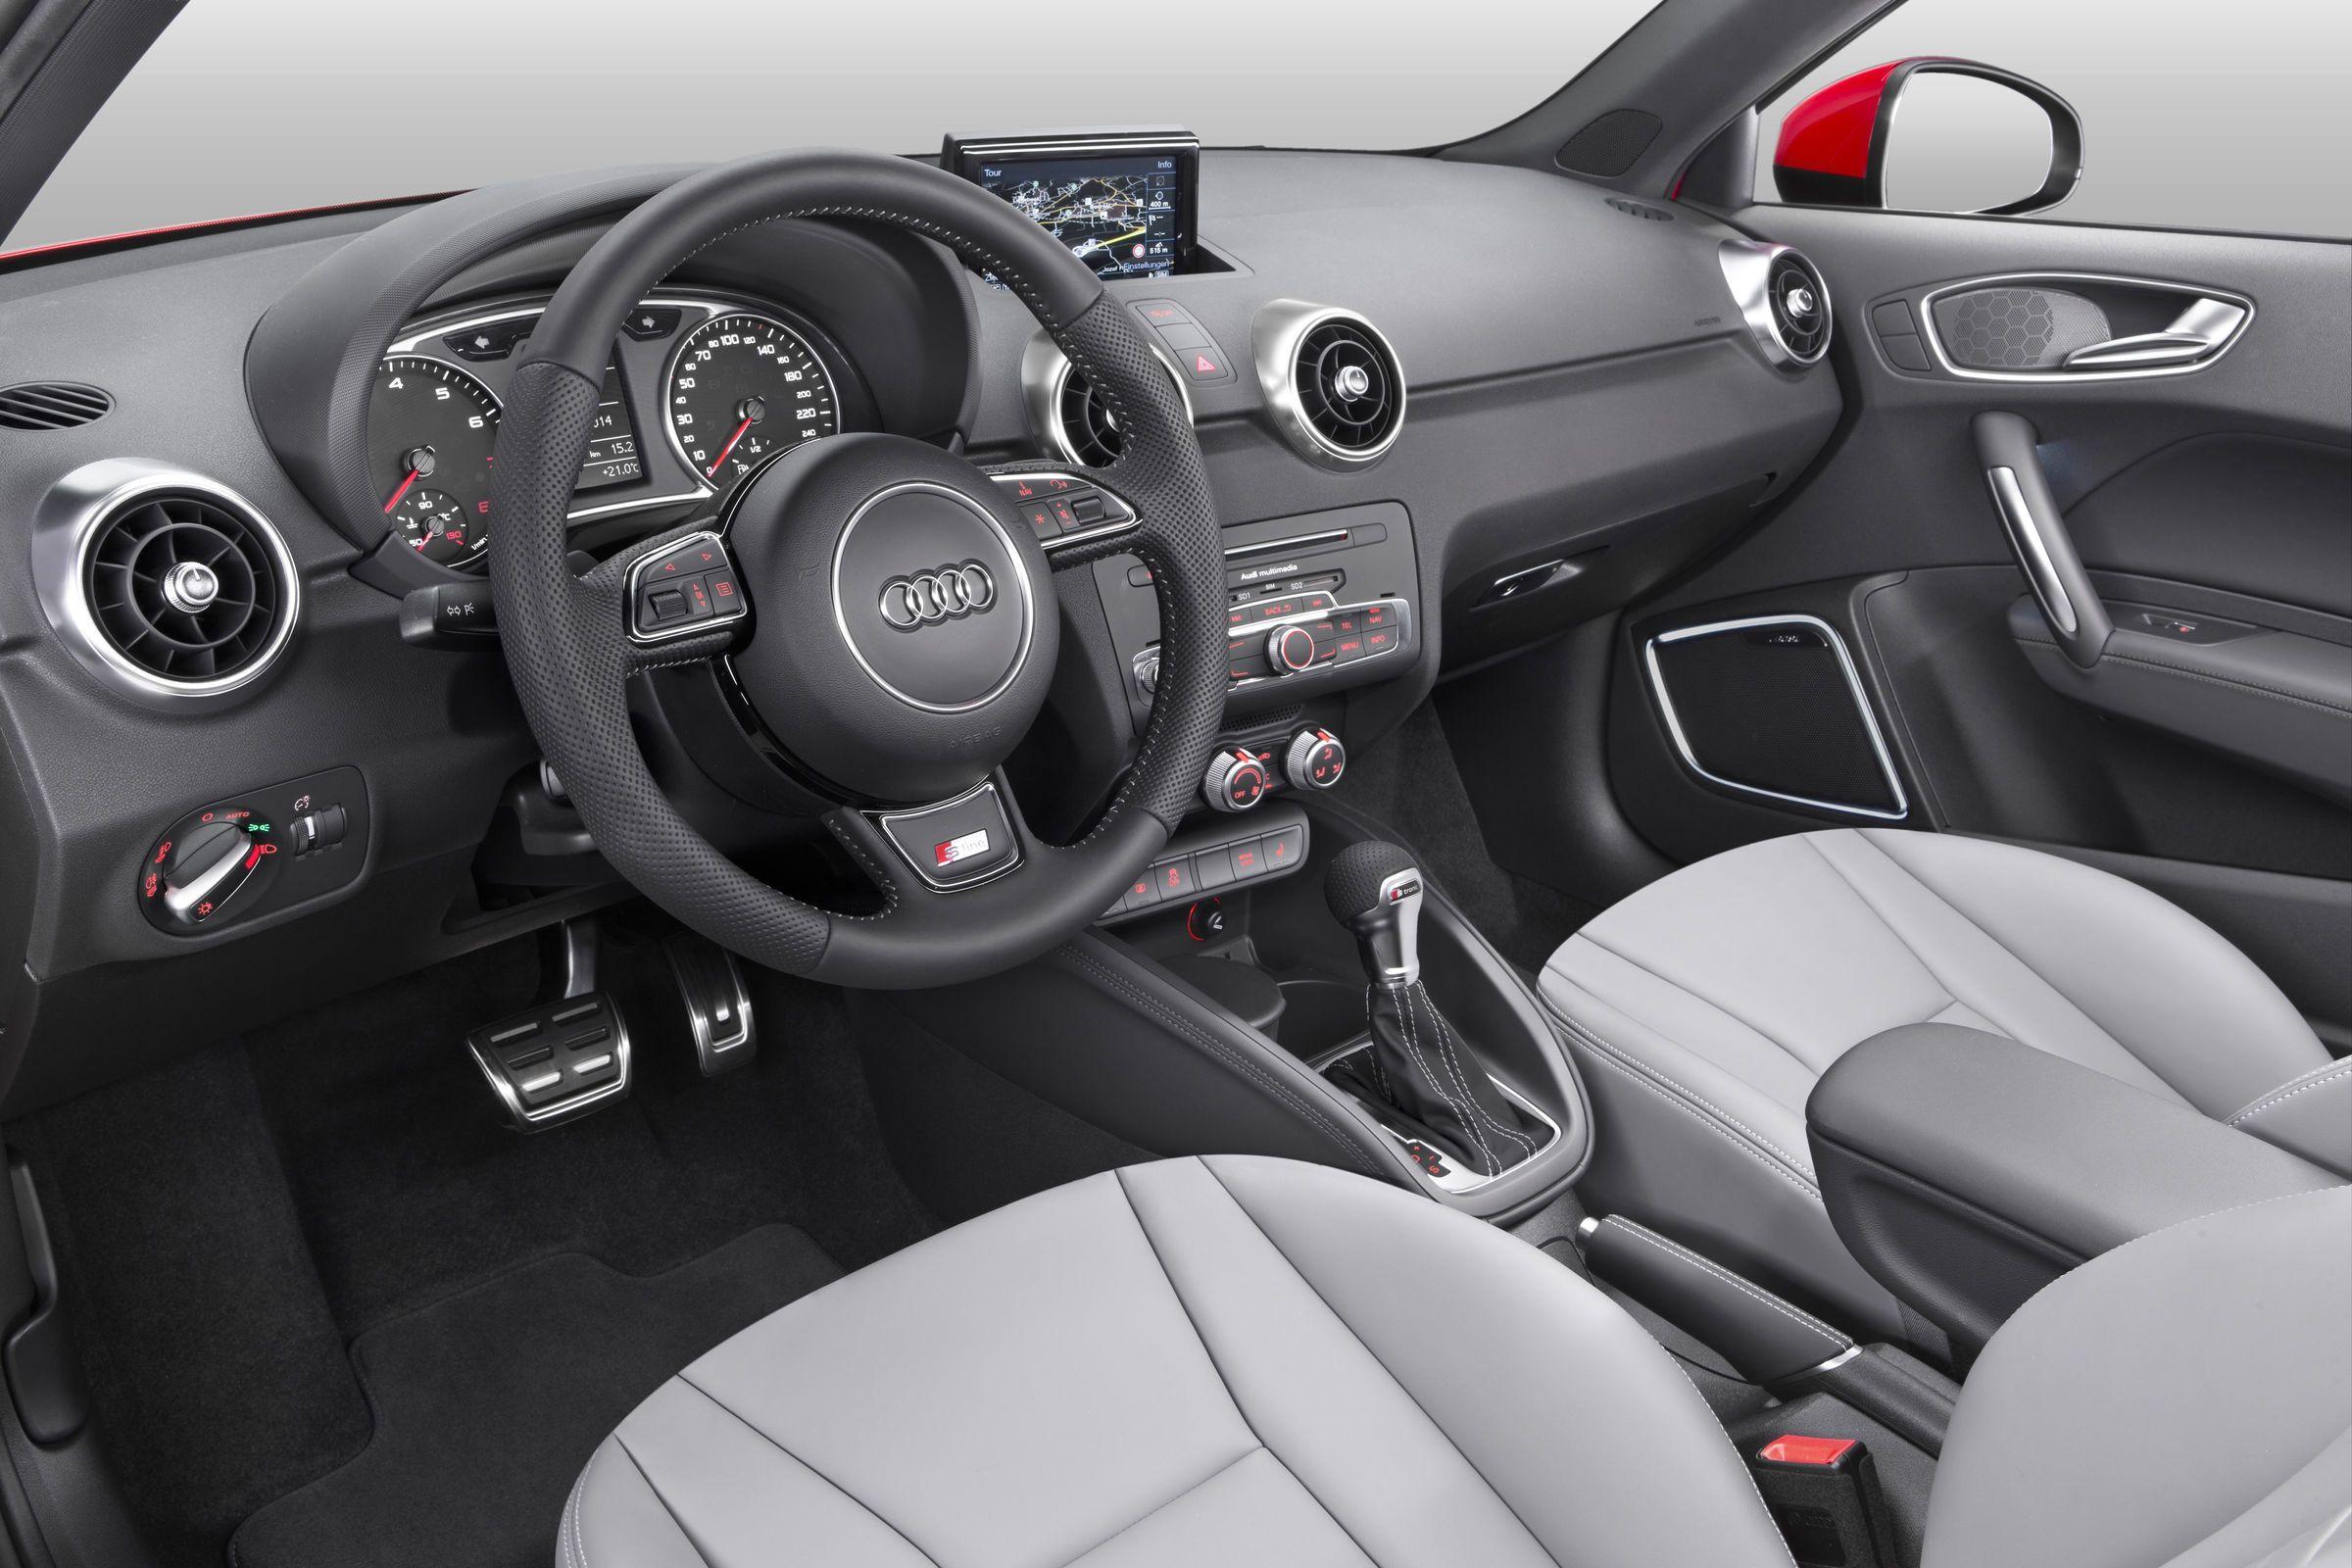 New Audi A1 Quattro Interior Audi Interior Audi A1 Quattro Audi A1